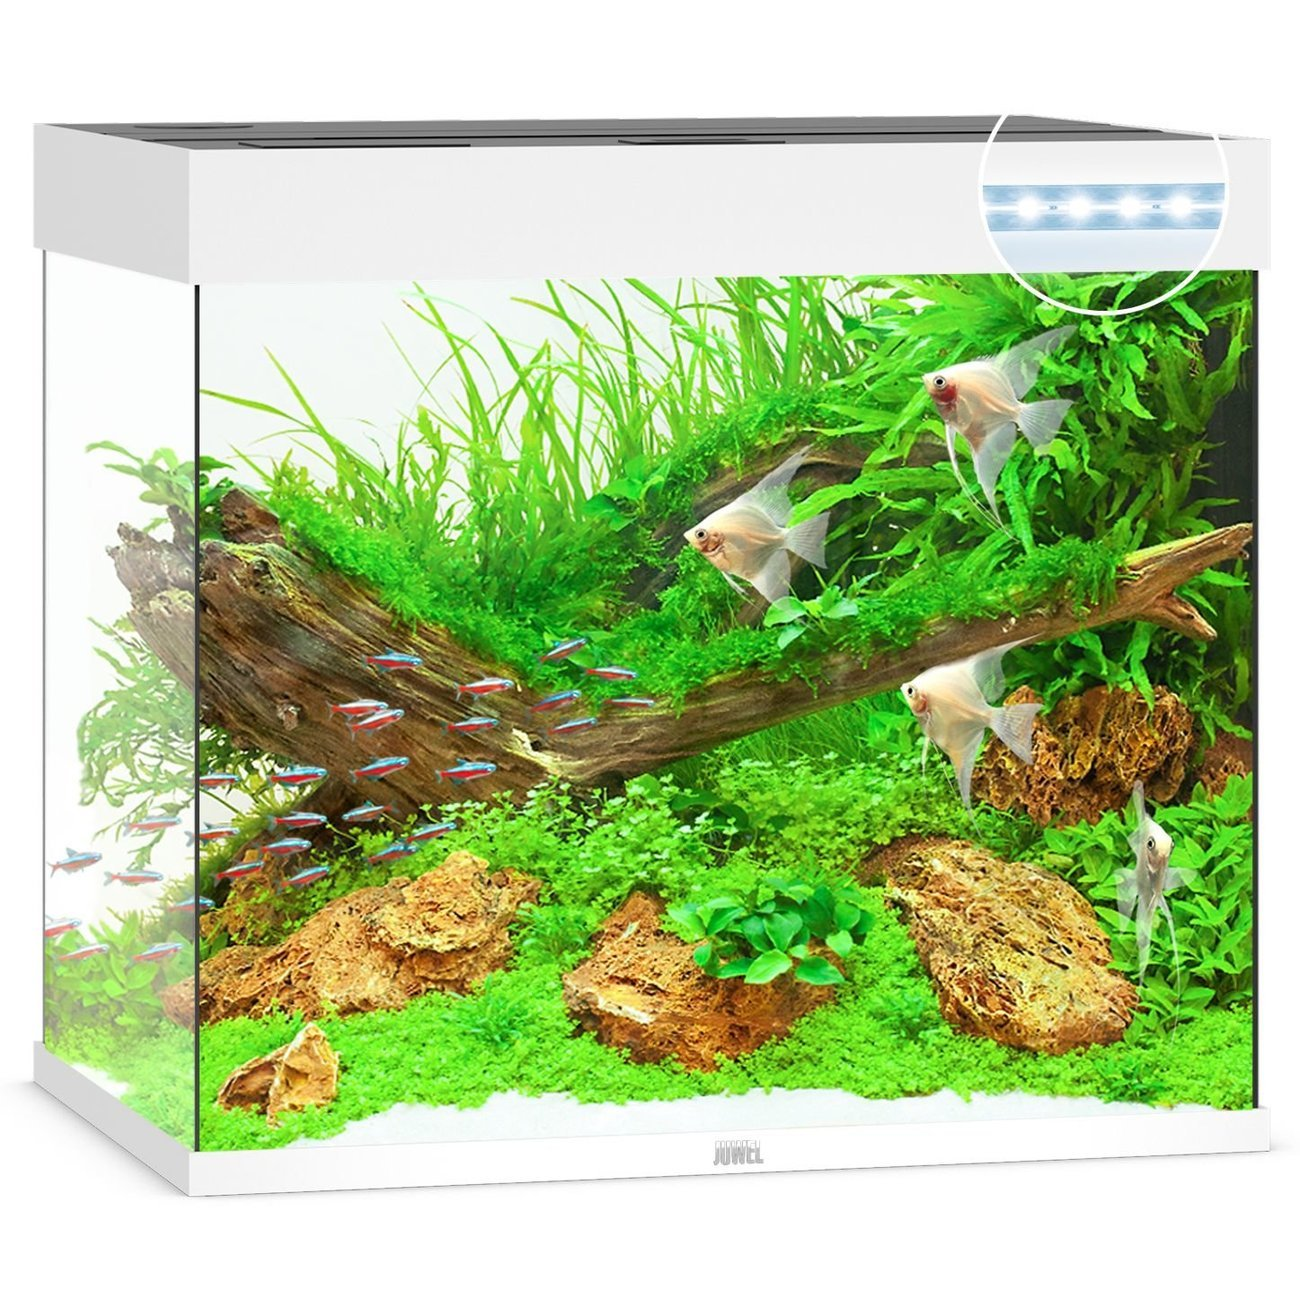 JUWEL Lido 200 LED Aquarium, 200 Liter, weiß